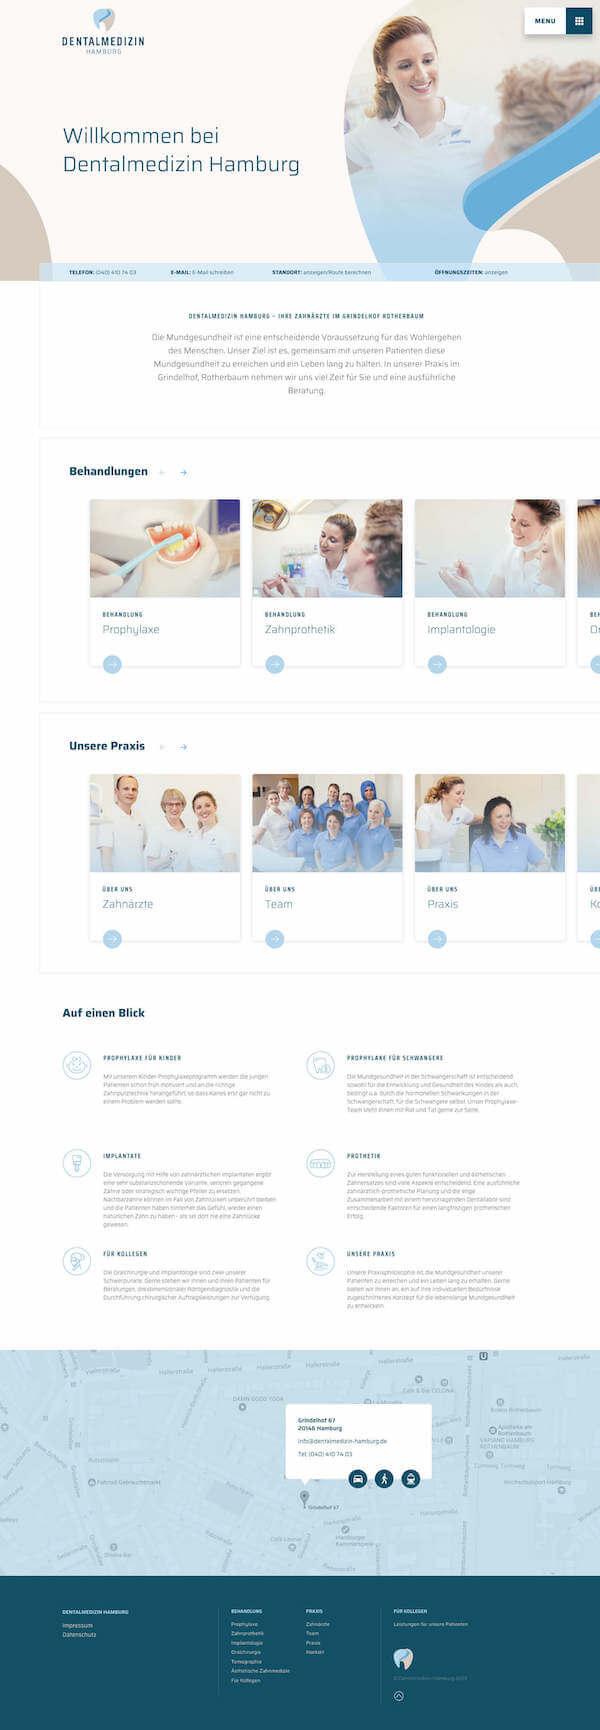 Preview of the project Dentalmedizin